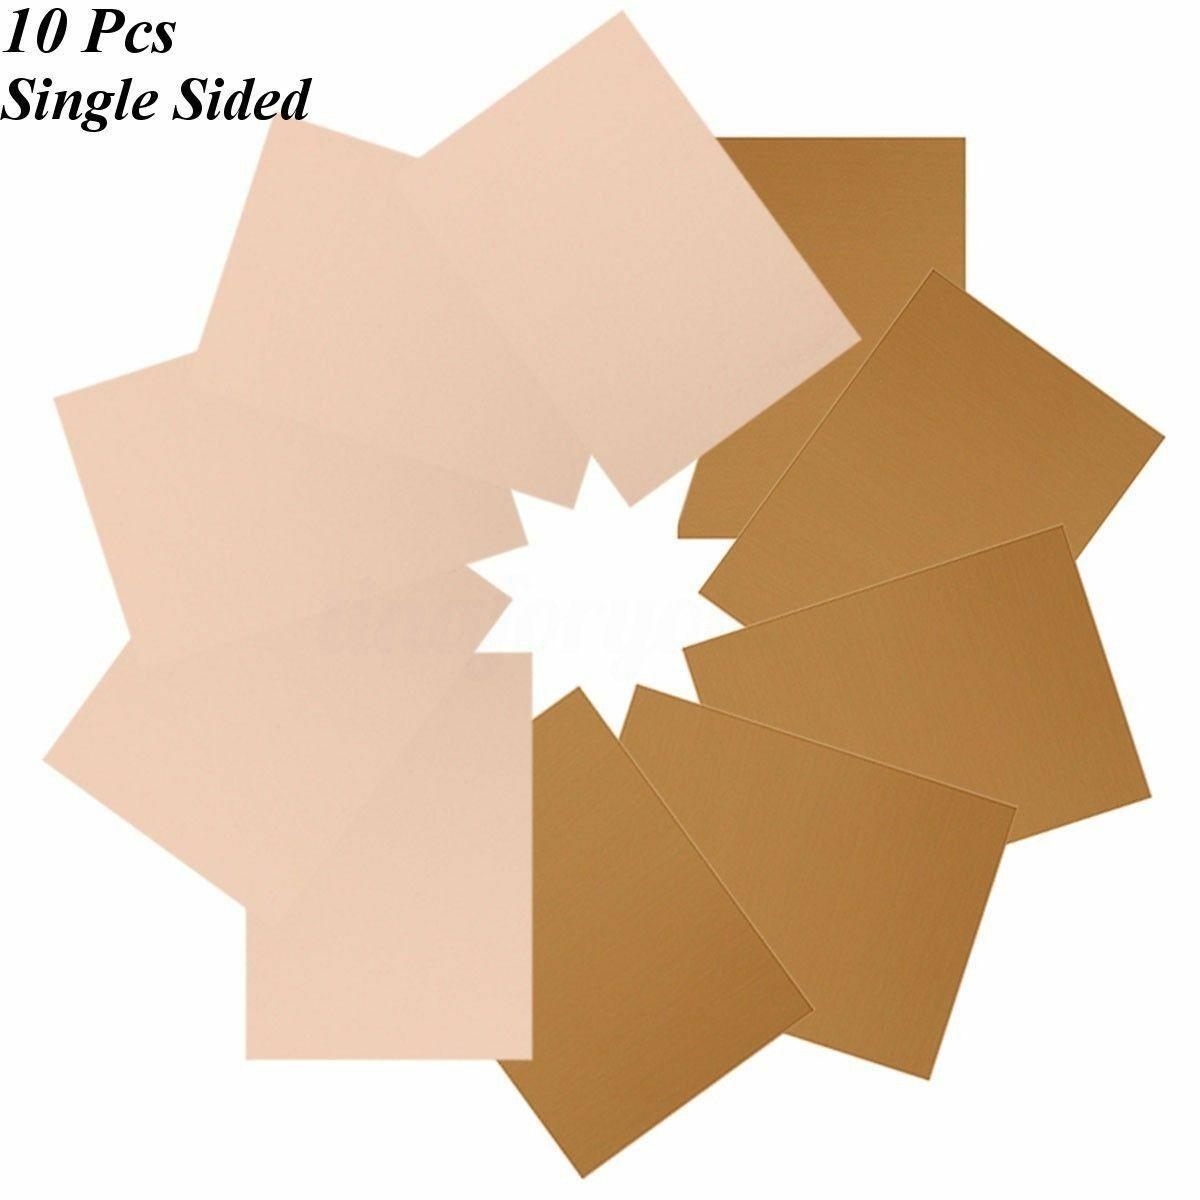 10 Pcs 1.5mm FR4 Copper Clad Plate Laminate PCB Printed Circuit Board 100x150mm 10PCS 10*15 single-sided fiberglass board